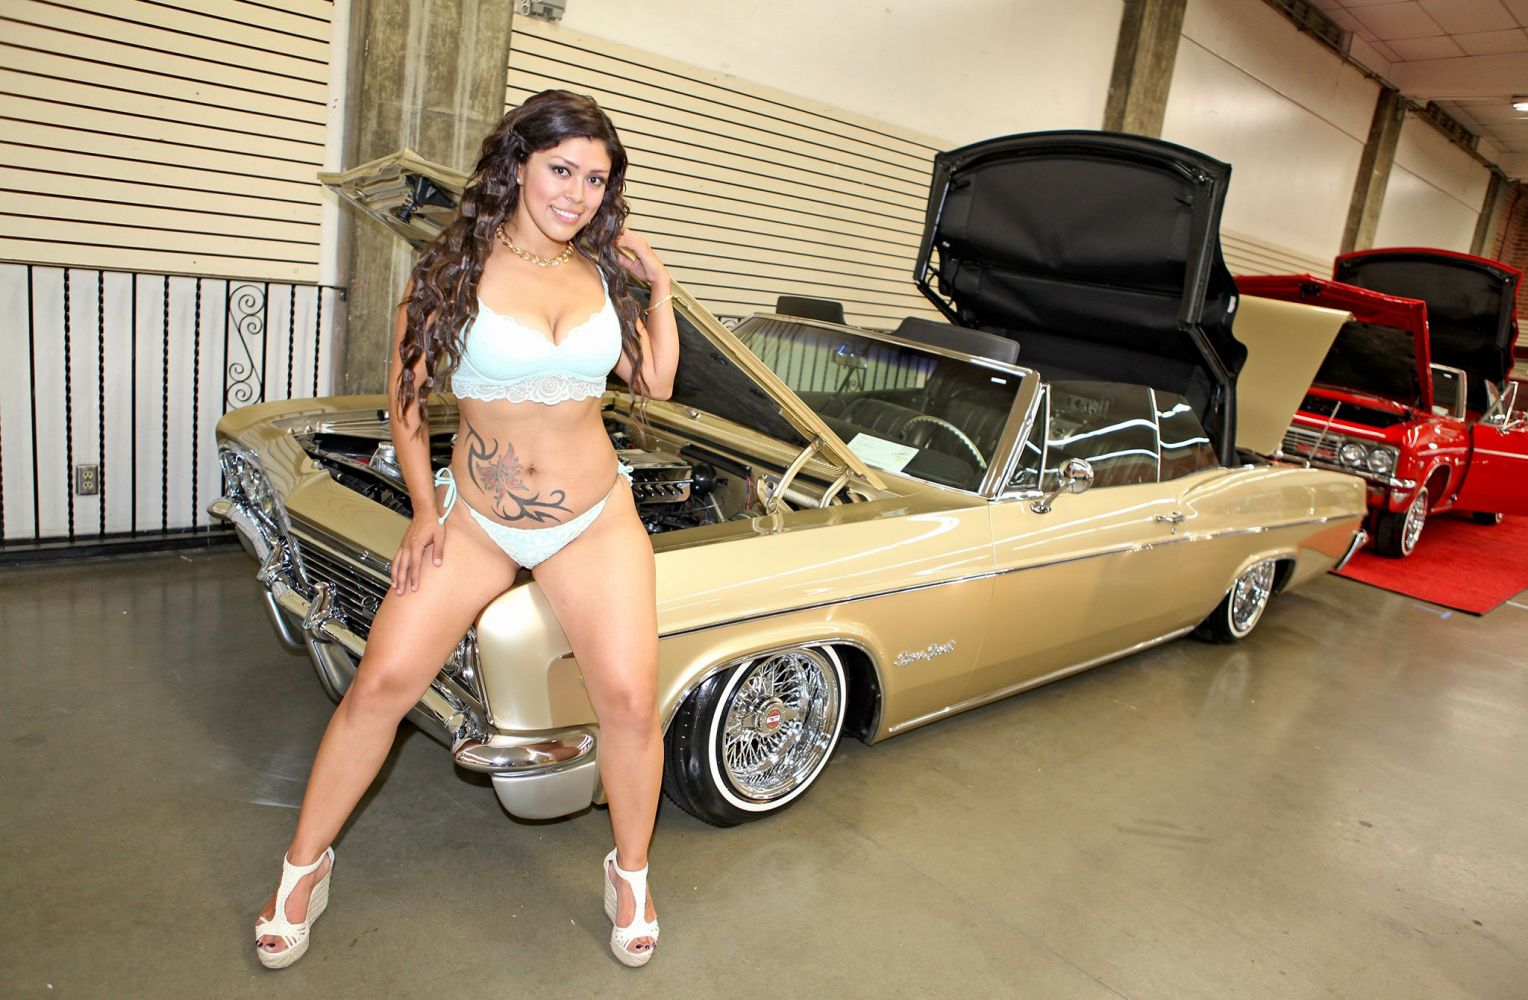 Topless lowrider model